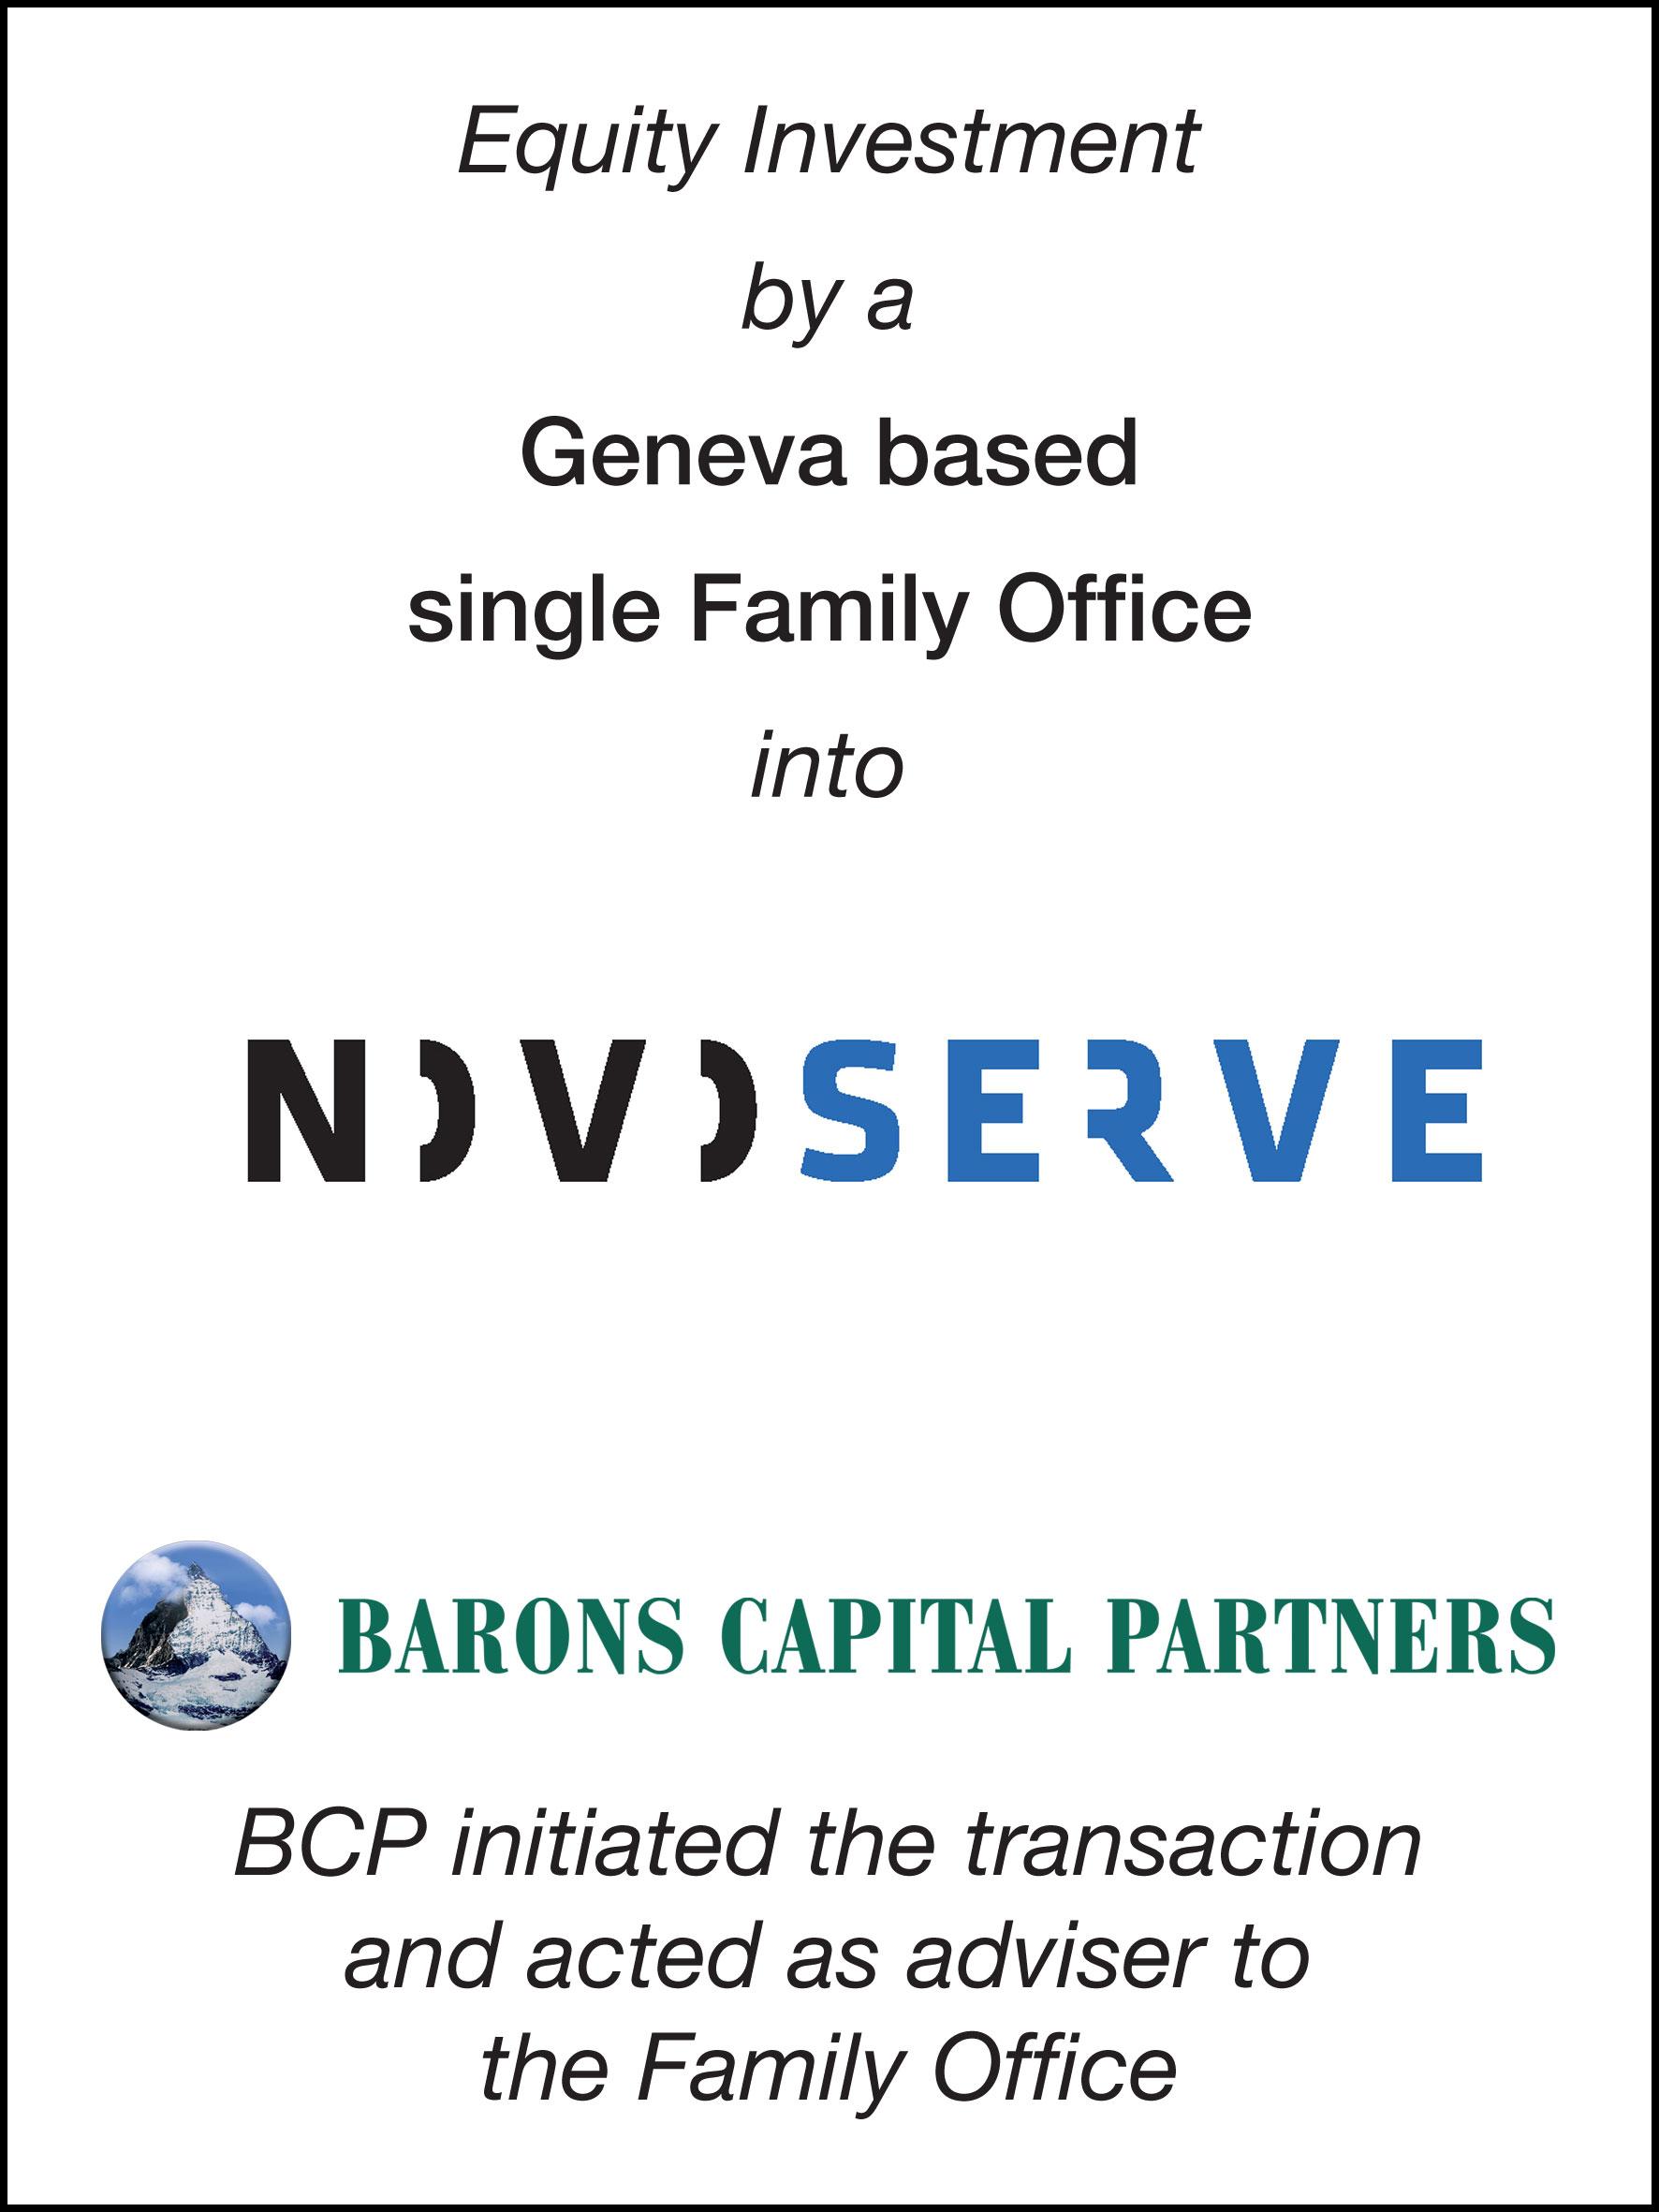 3_Novo Internet Ventures GmbH